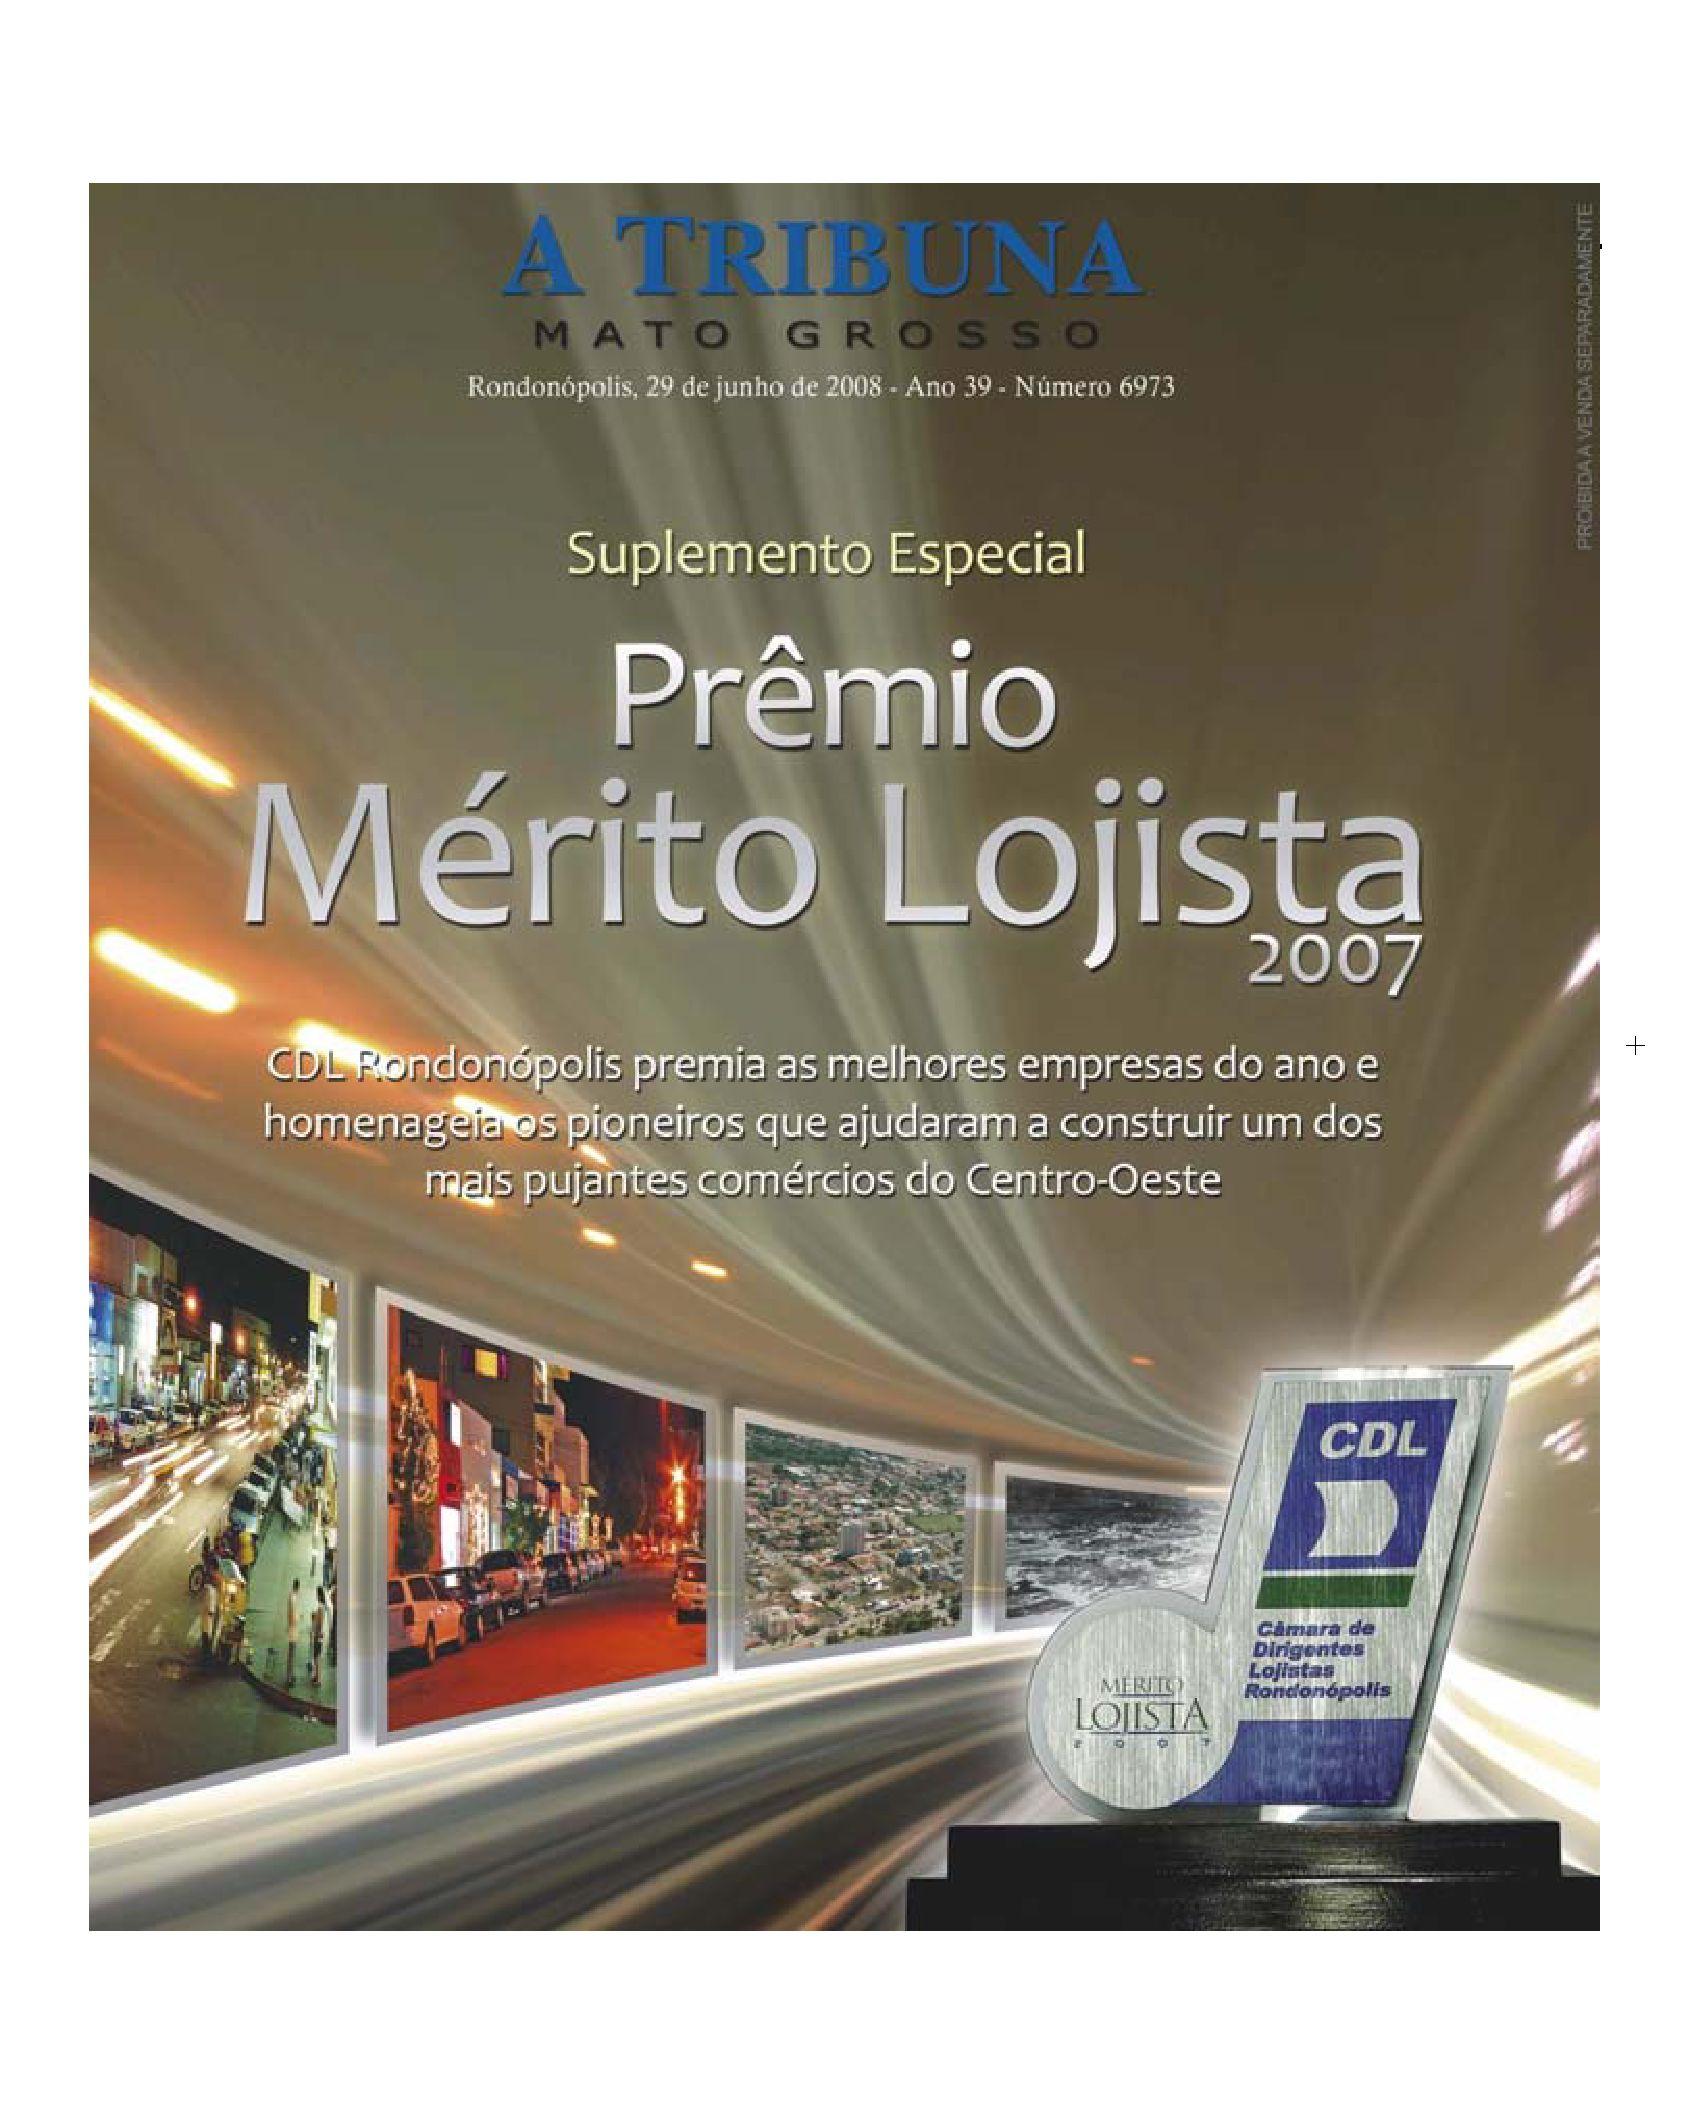 417ac7ca4d4 Suplemento Prêmio Mérito Logista 2007 by atribunamt - issuu